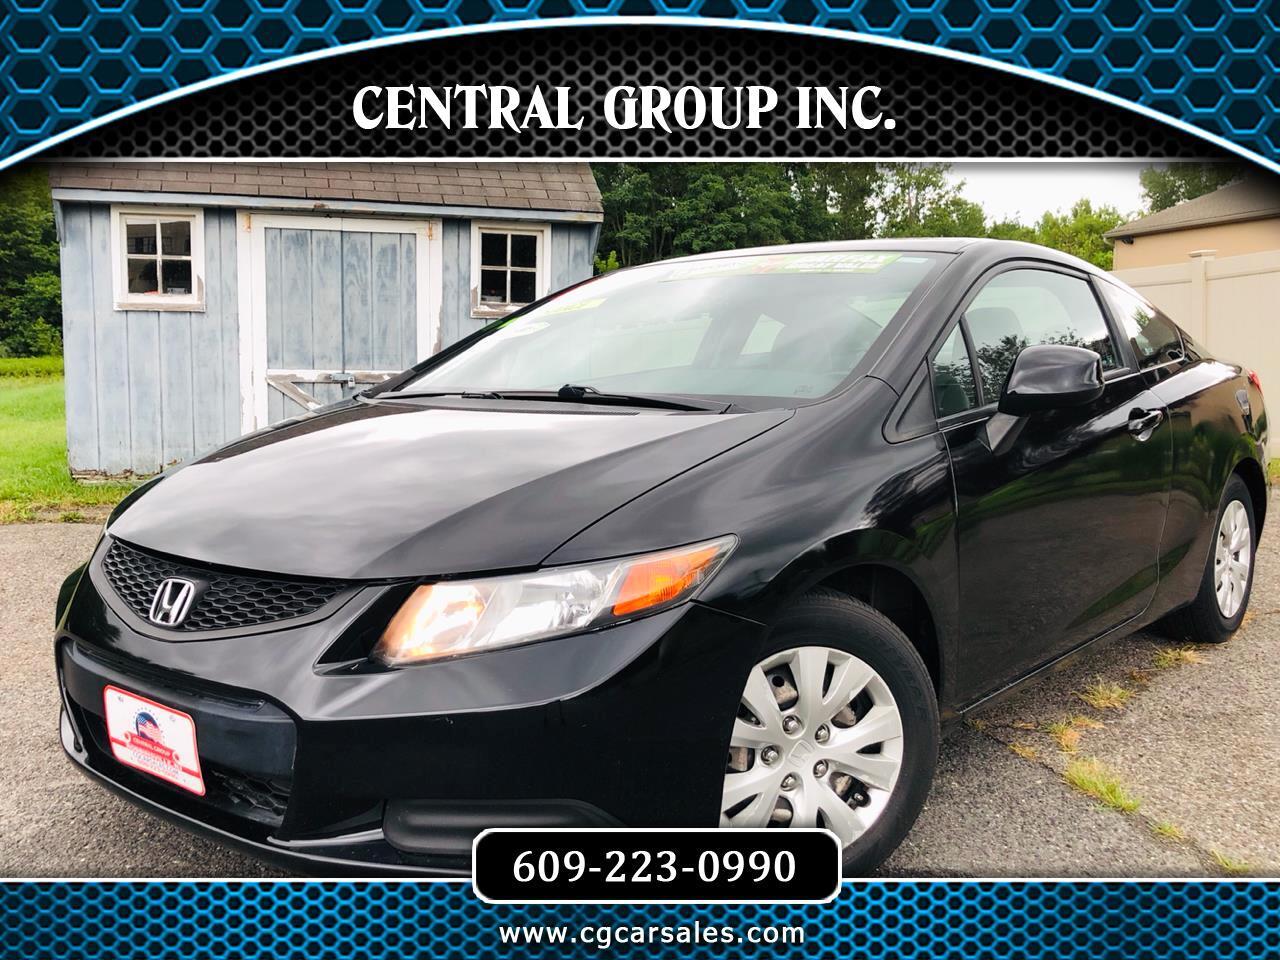 Honda Civic Cpe 2dr Auto LX 2012